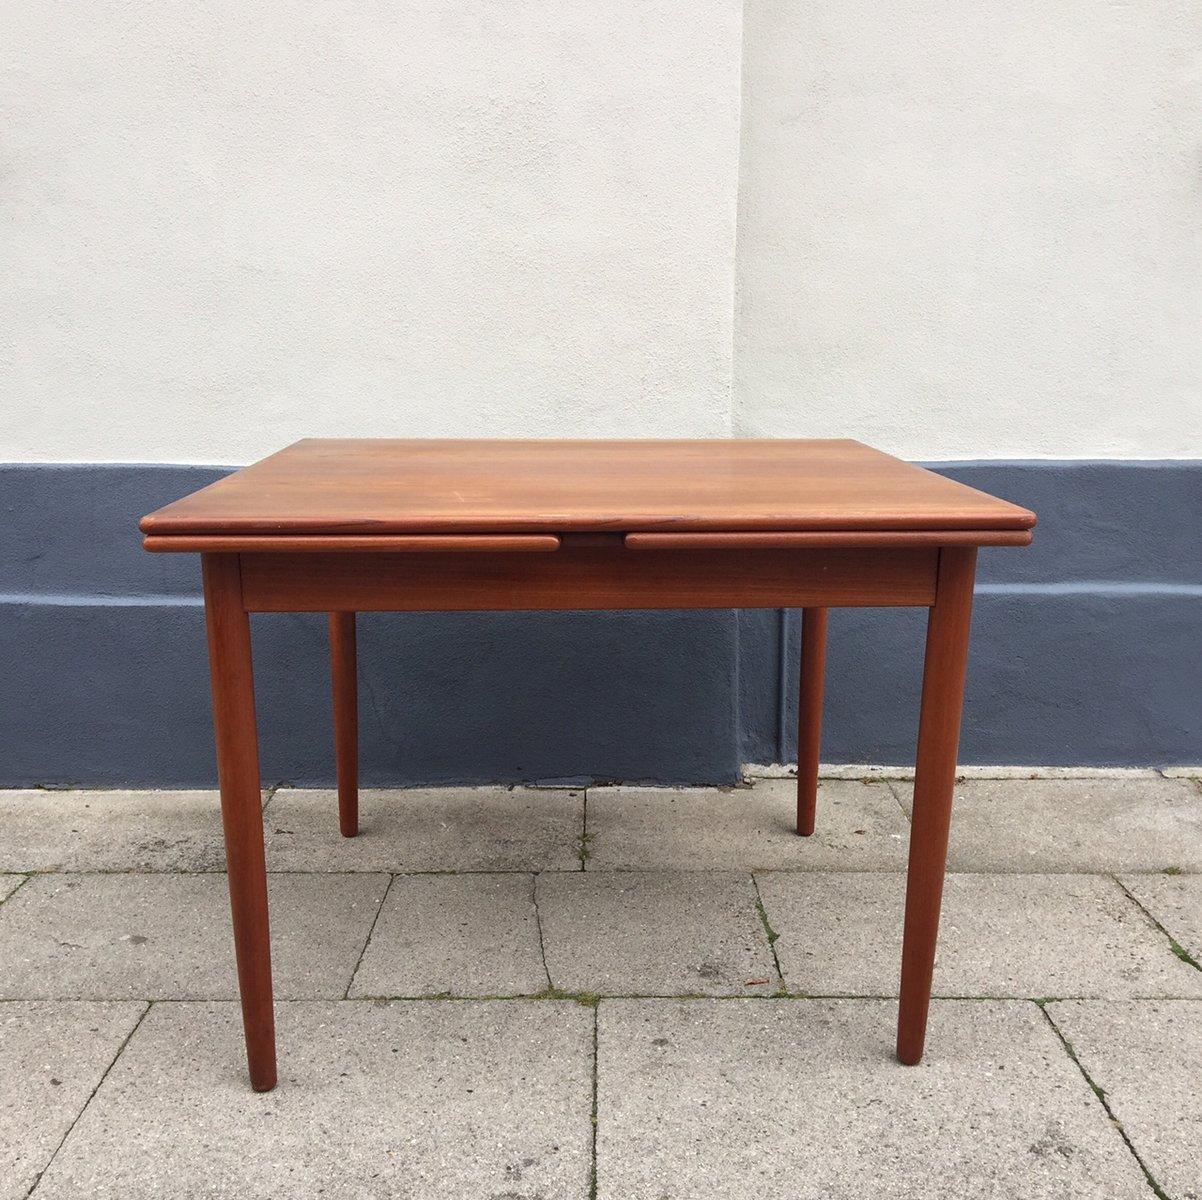 Danish Mid Century Extendable Teak Dining Table from Farstrup